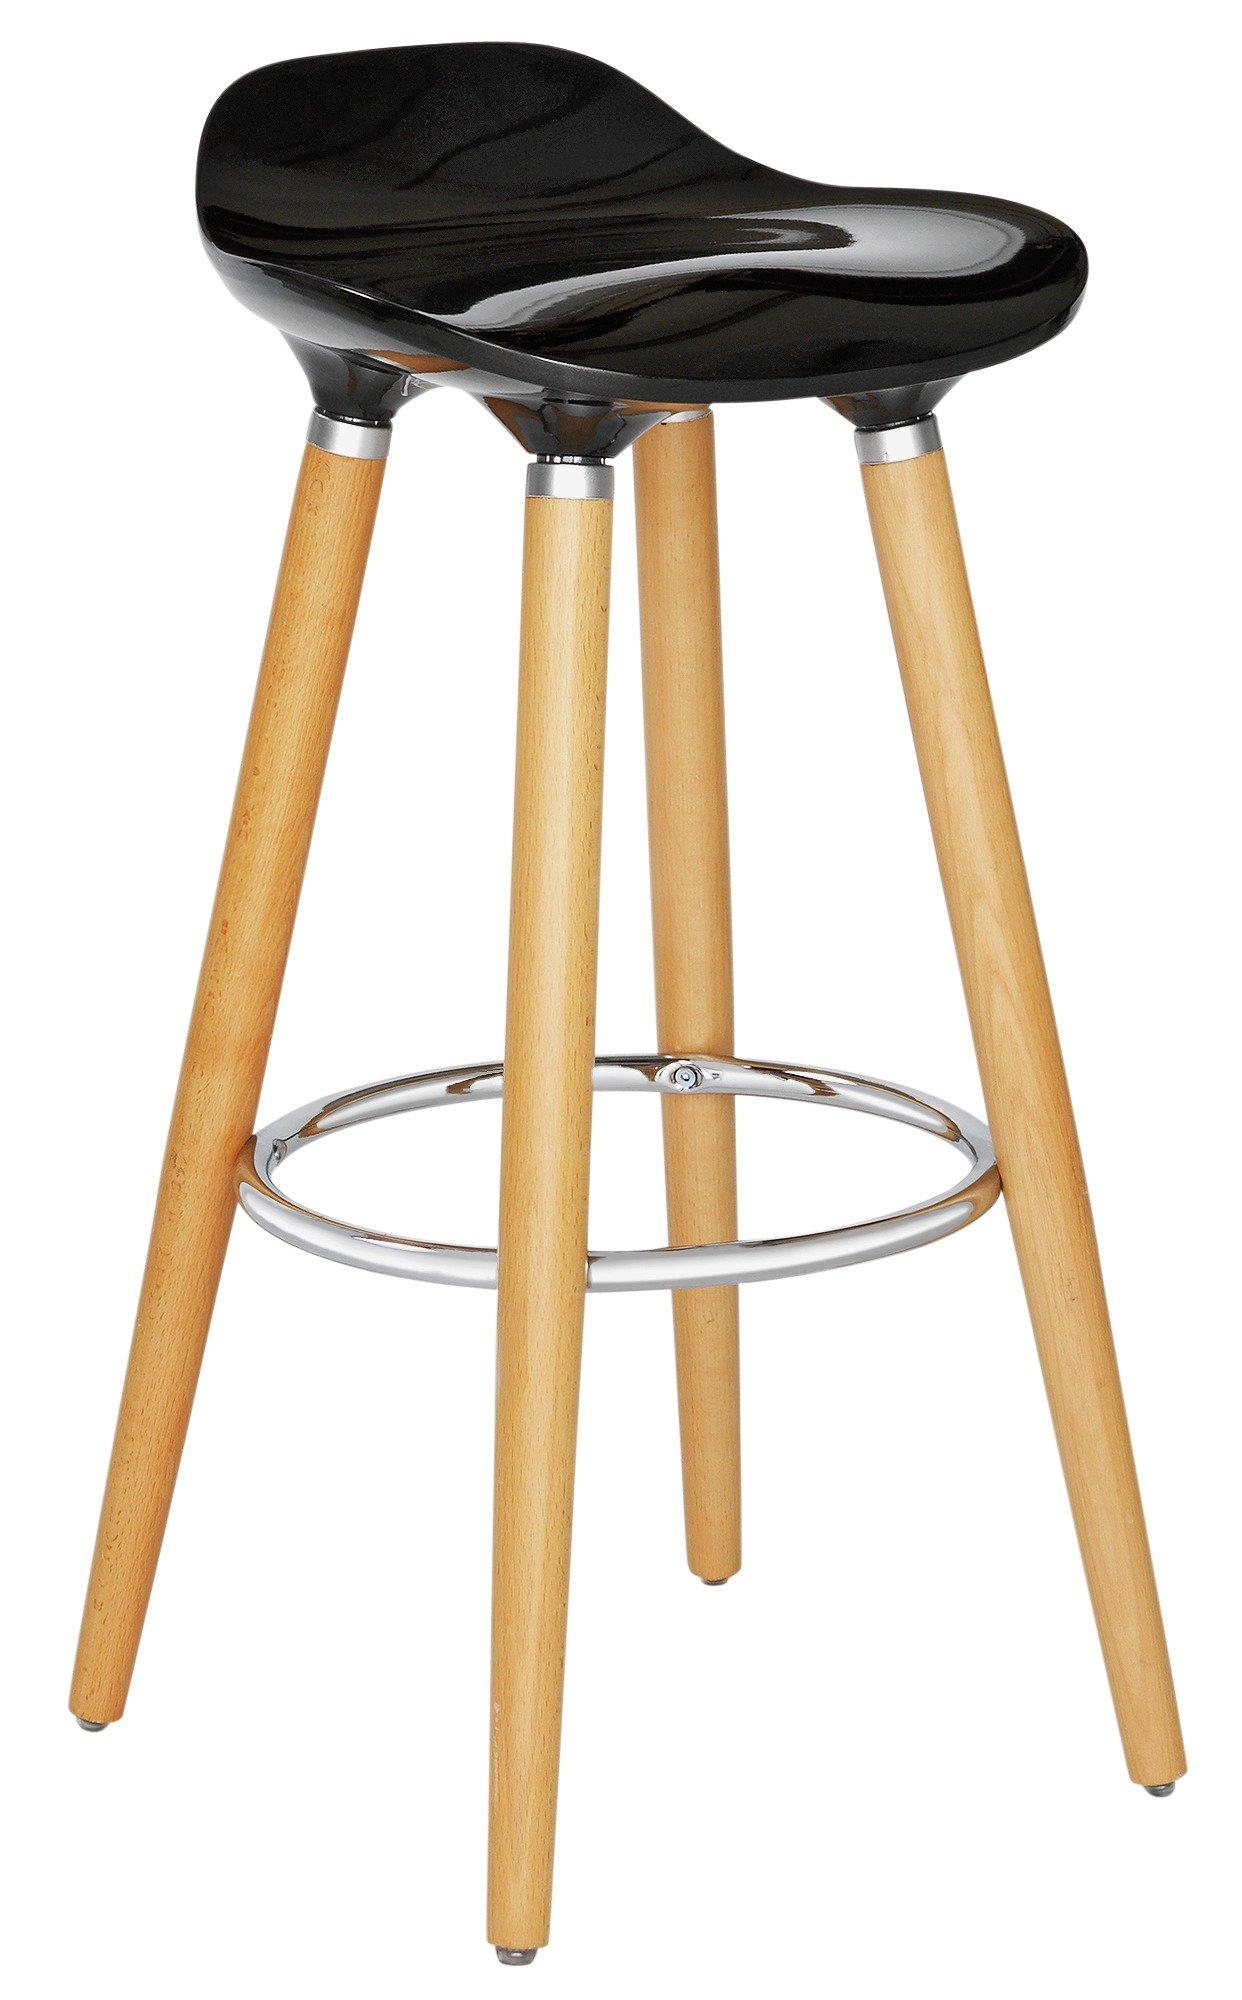 beach chairs uk argos wheelchair graphic sale on hygena bay bar stool black now